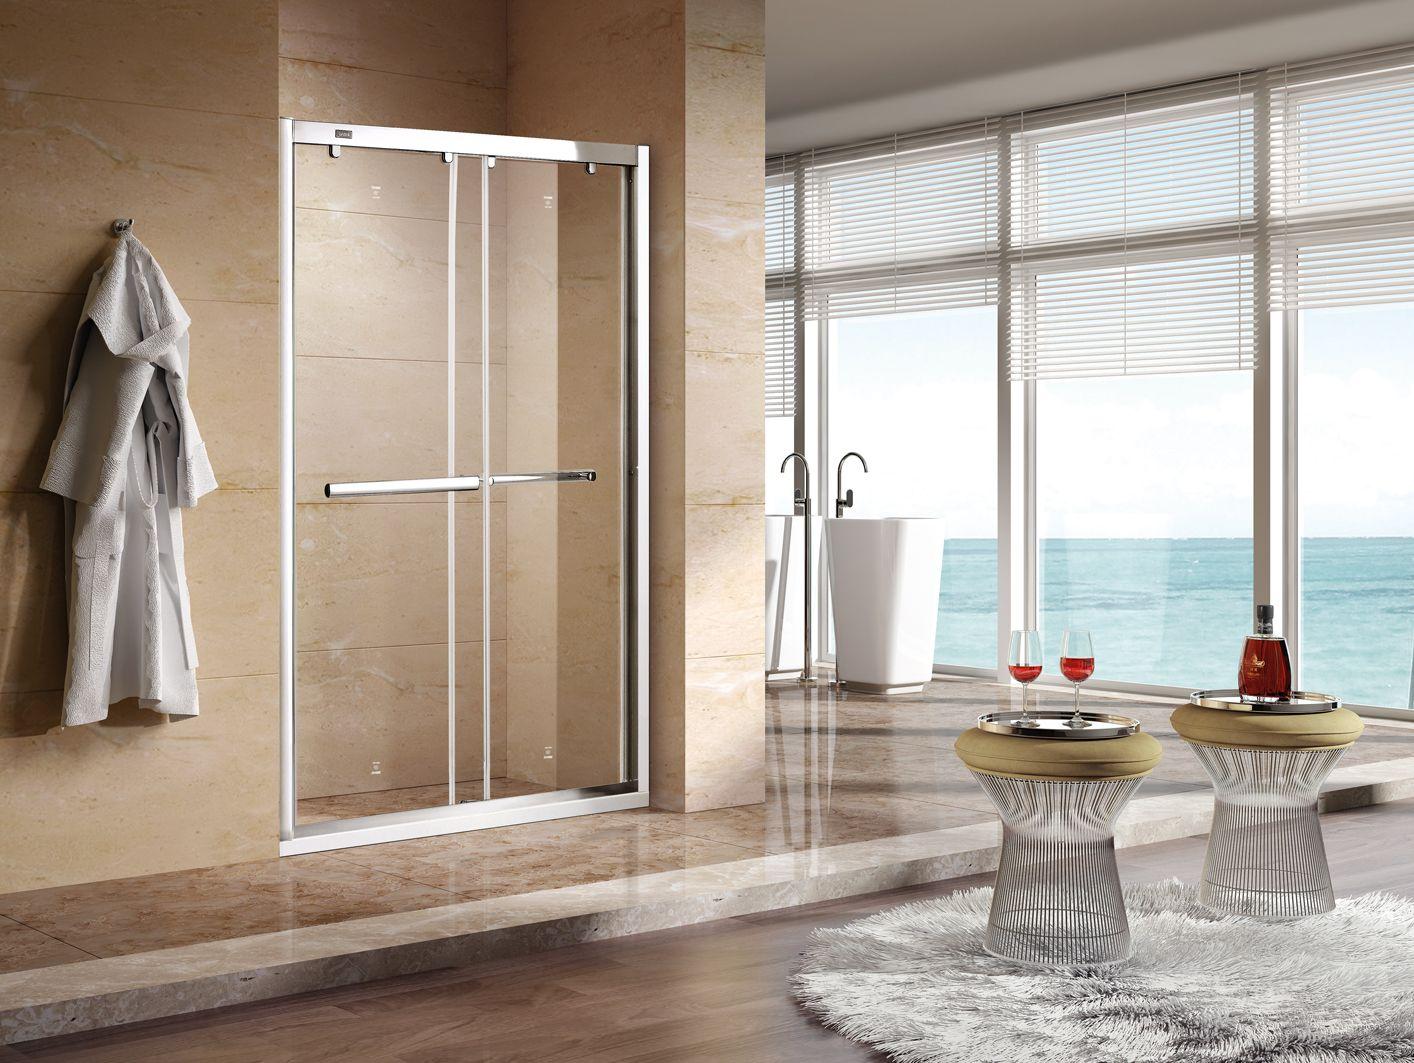 Select Shower Enclosures Shower Cubicles Glass Shower Doors Screen Cabin Bathtub That Compl Shower Doors Shower Enclosure Frameless Glass Shower Enclosure